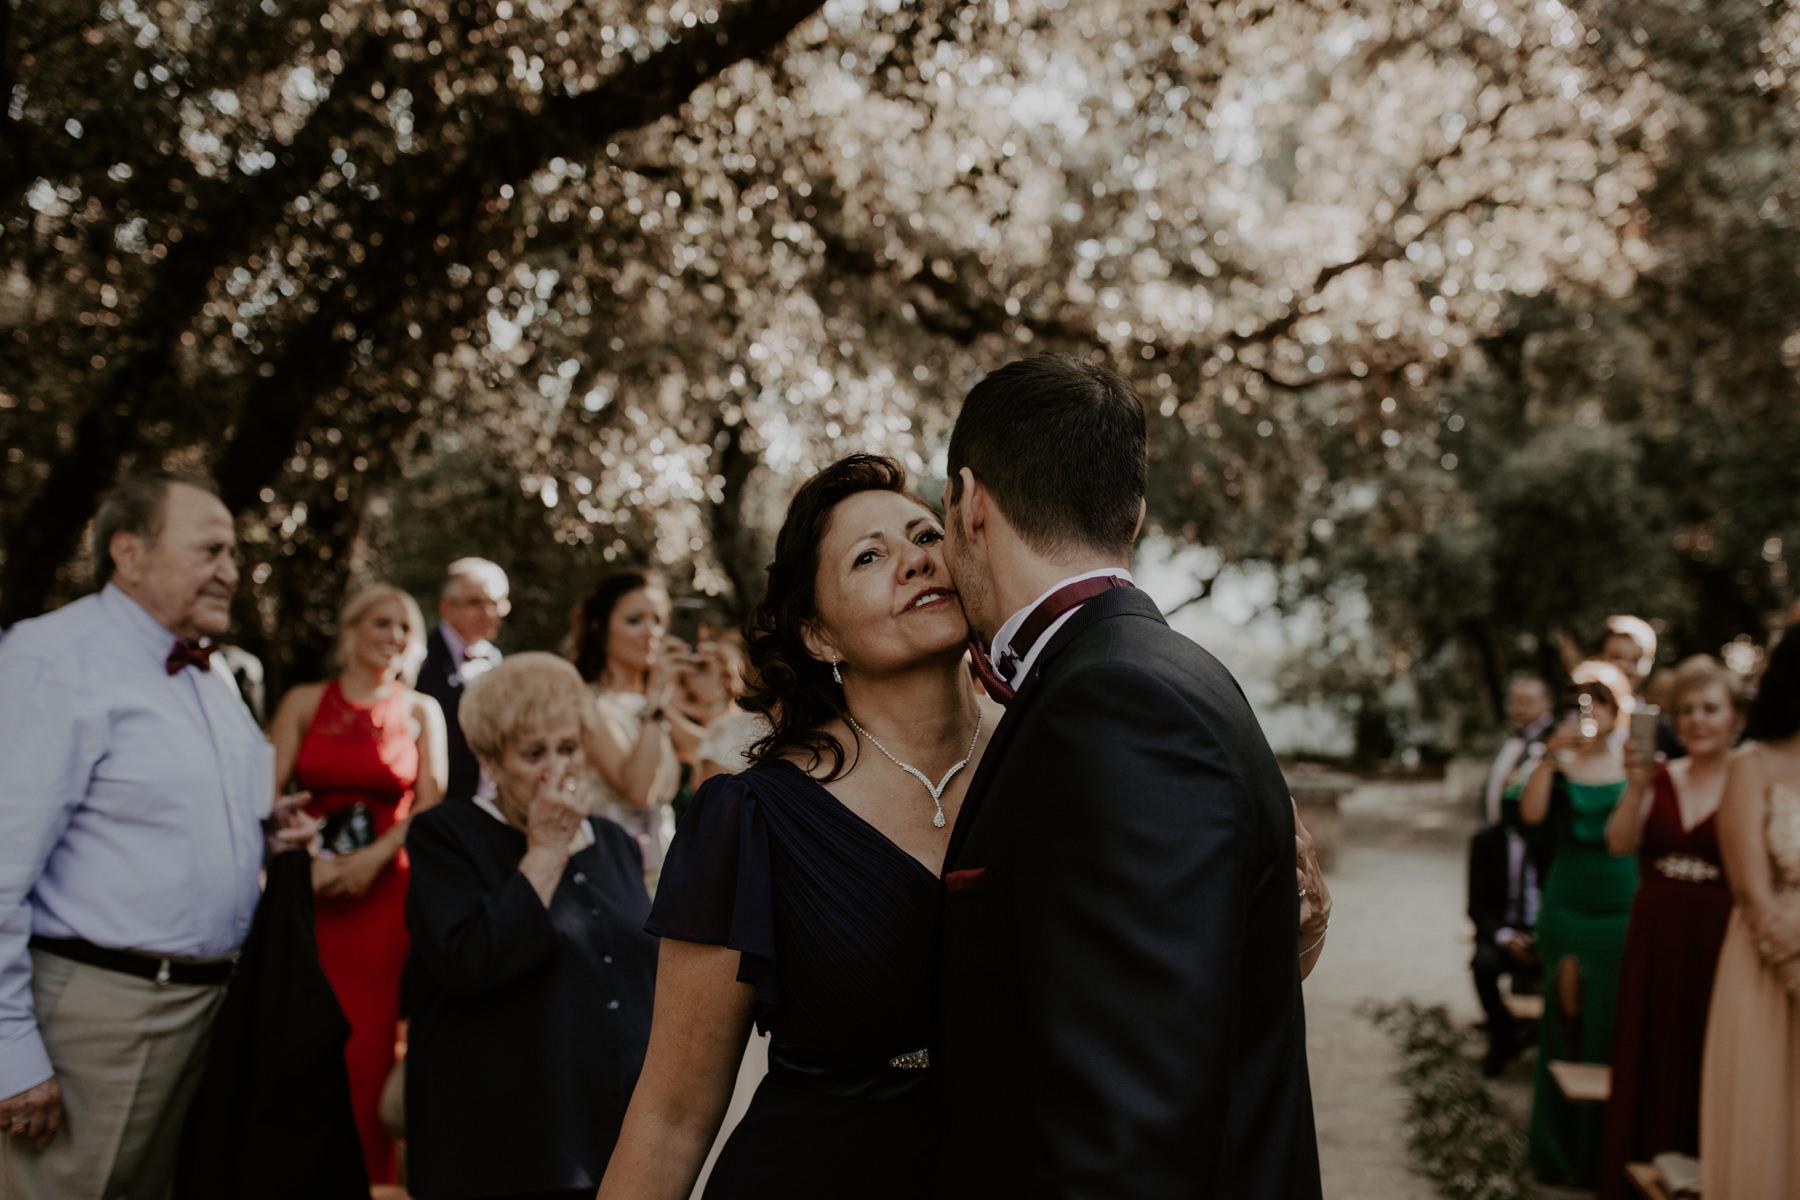 alt_thenortherngirlphotography_couples_weddingphotographer_photographer_wedding_boda_fotografodebodas_fotografobodasbarcelona_bodaindie_bodasconestilo_bodaensantperedeclara_jennifermiguel-279.jpg